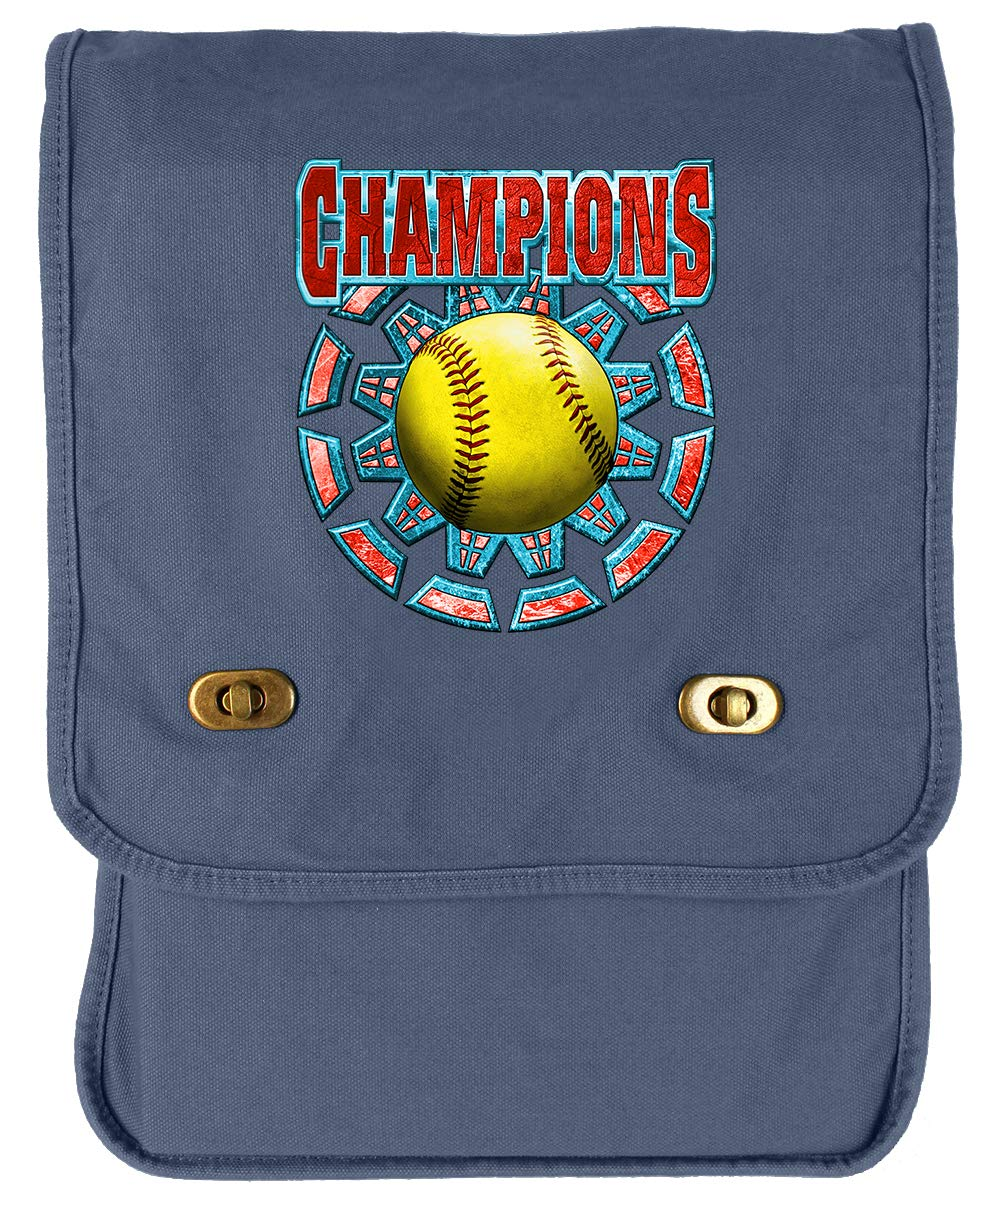 Tenacitee Softball Champions Royal Blue Brushed Canvas Messenger Bag